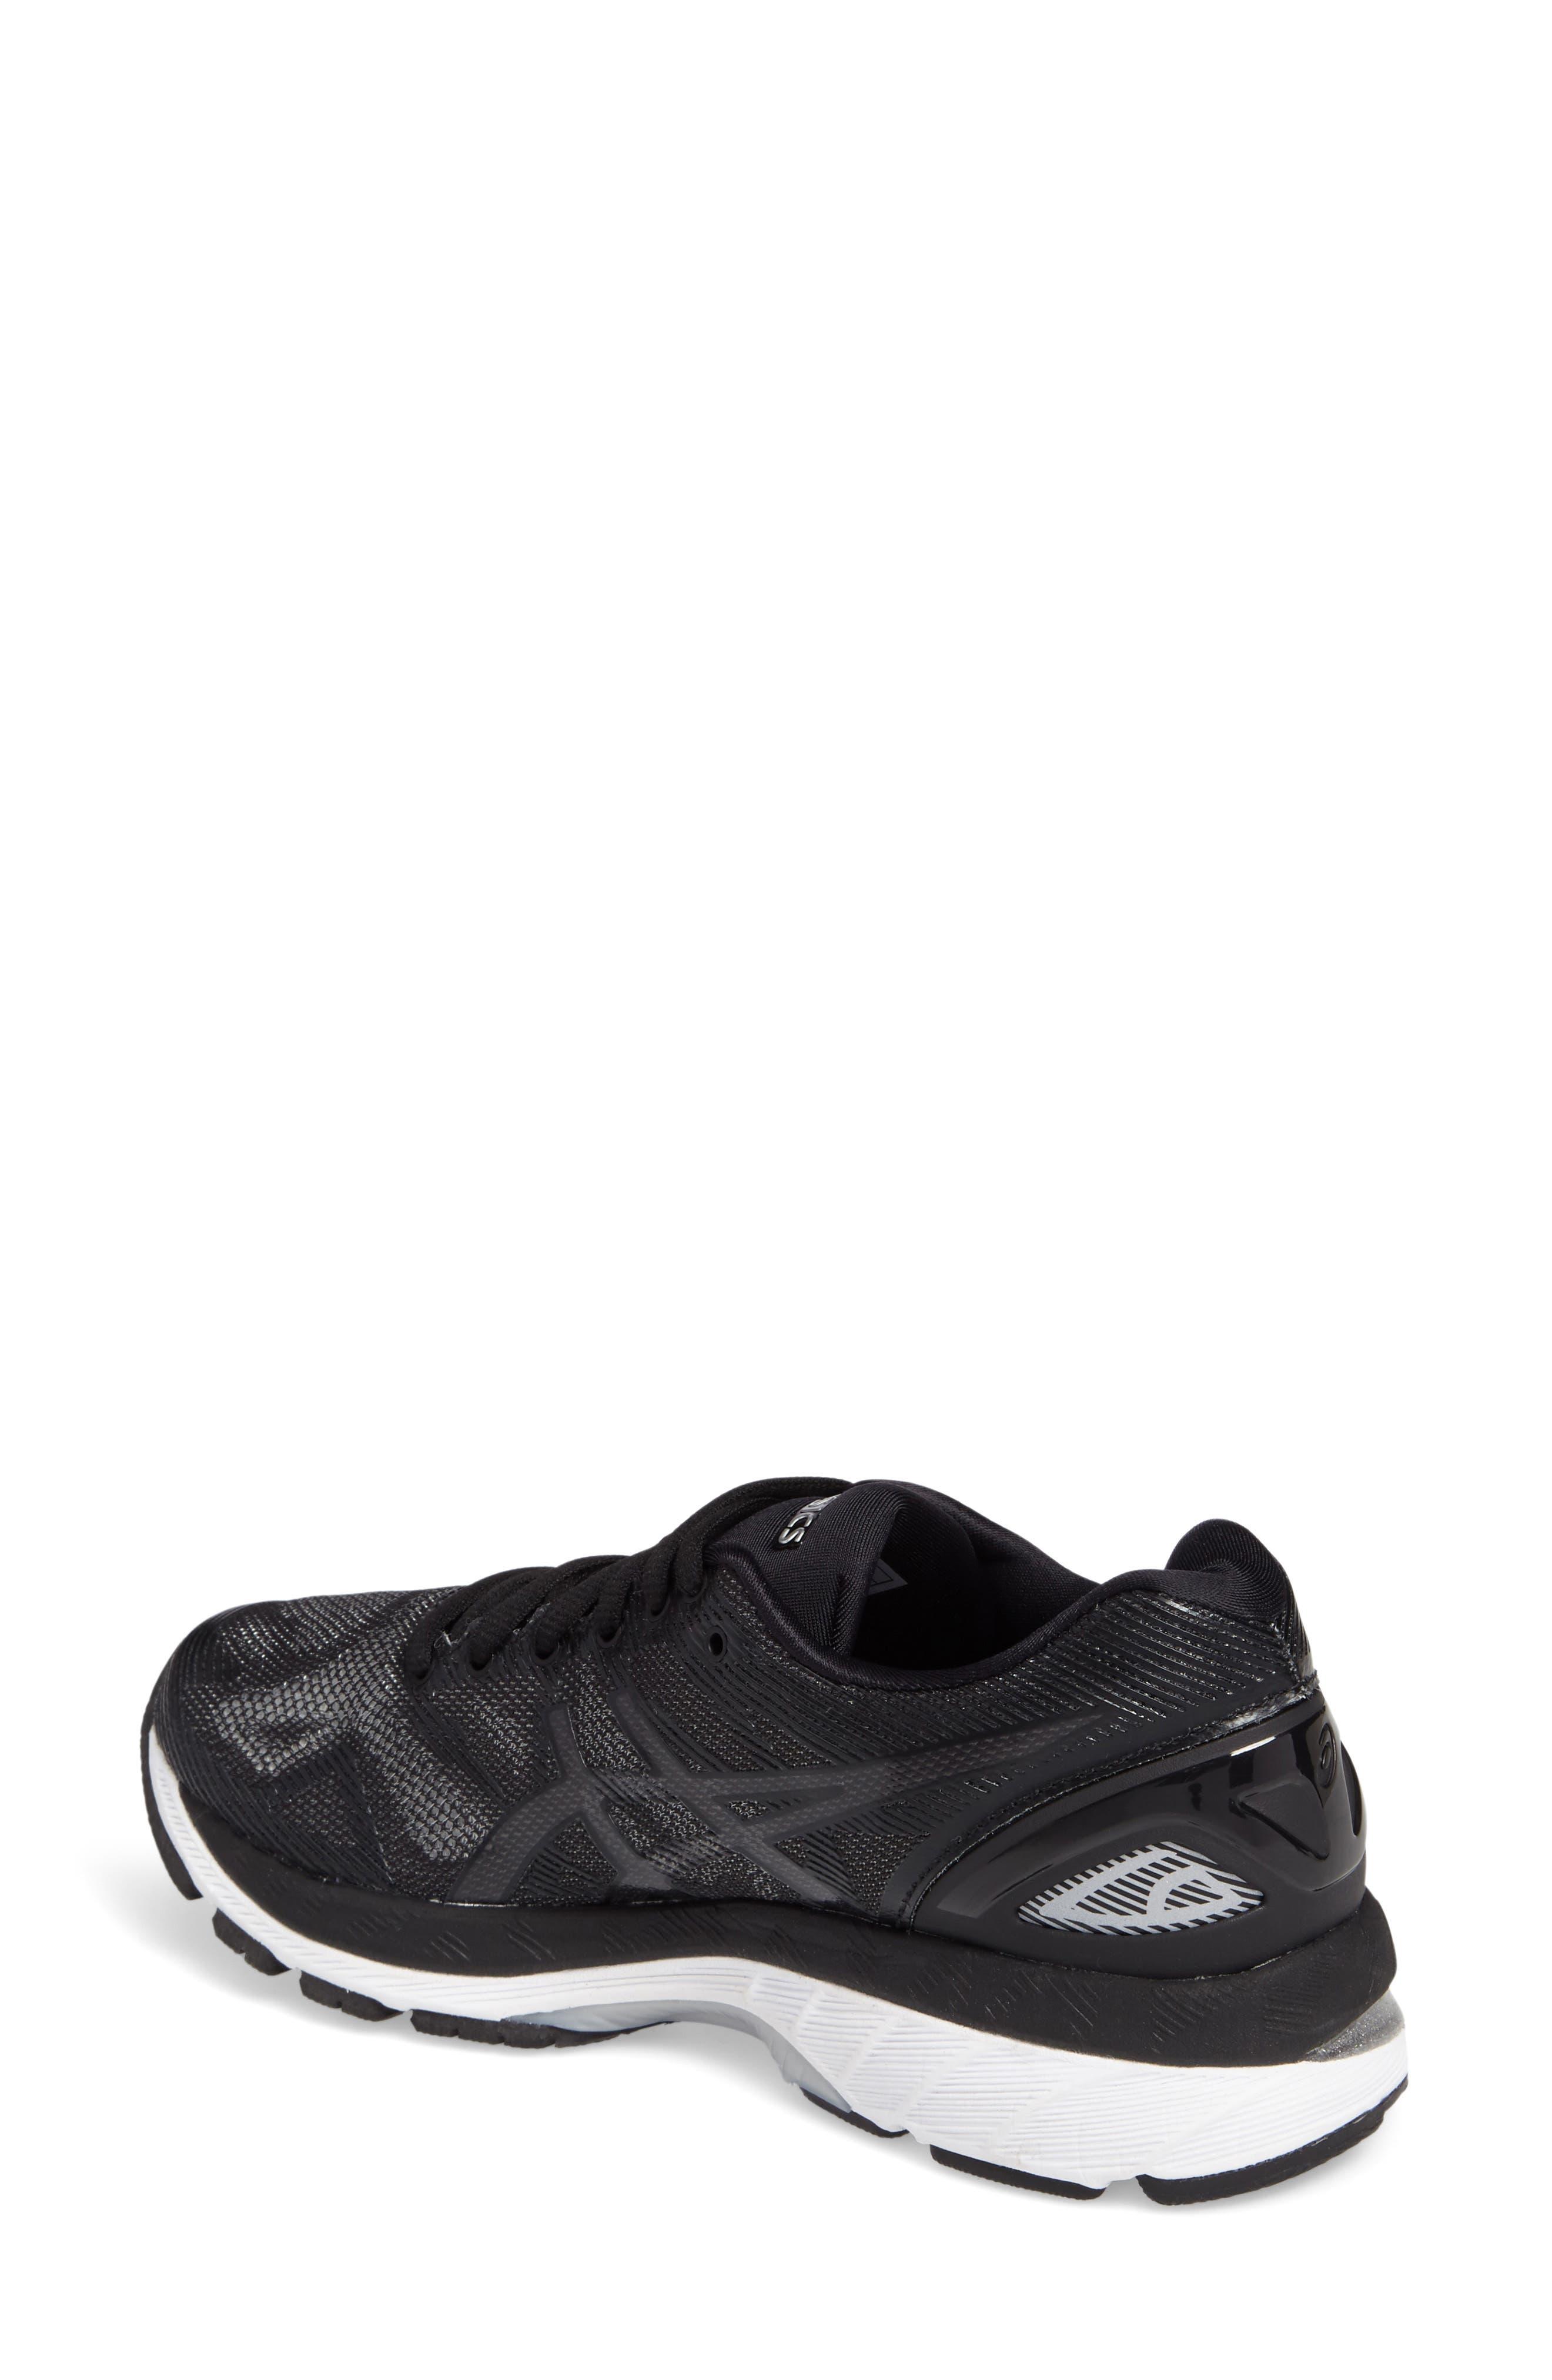 GEL<sup>®</sup>-Nimbus 19 Running Shoe,                             Alternate thumbnail 2, color,                             009